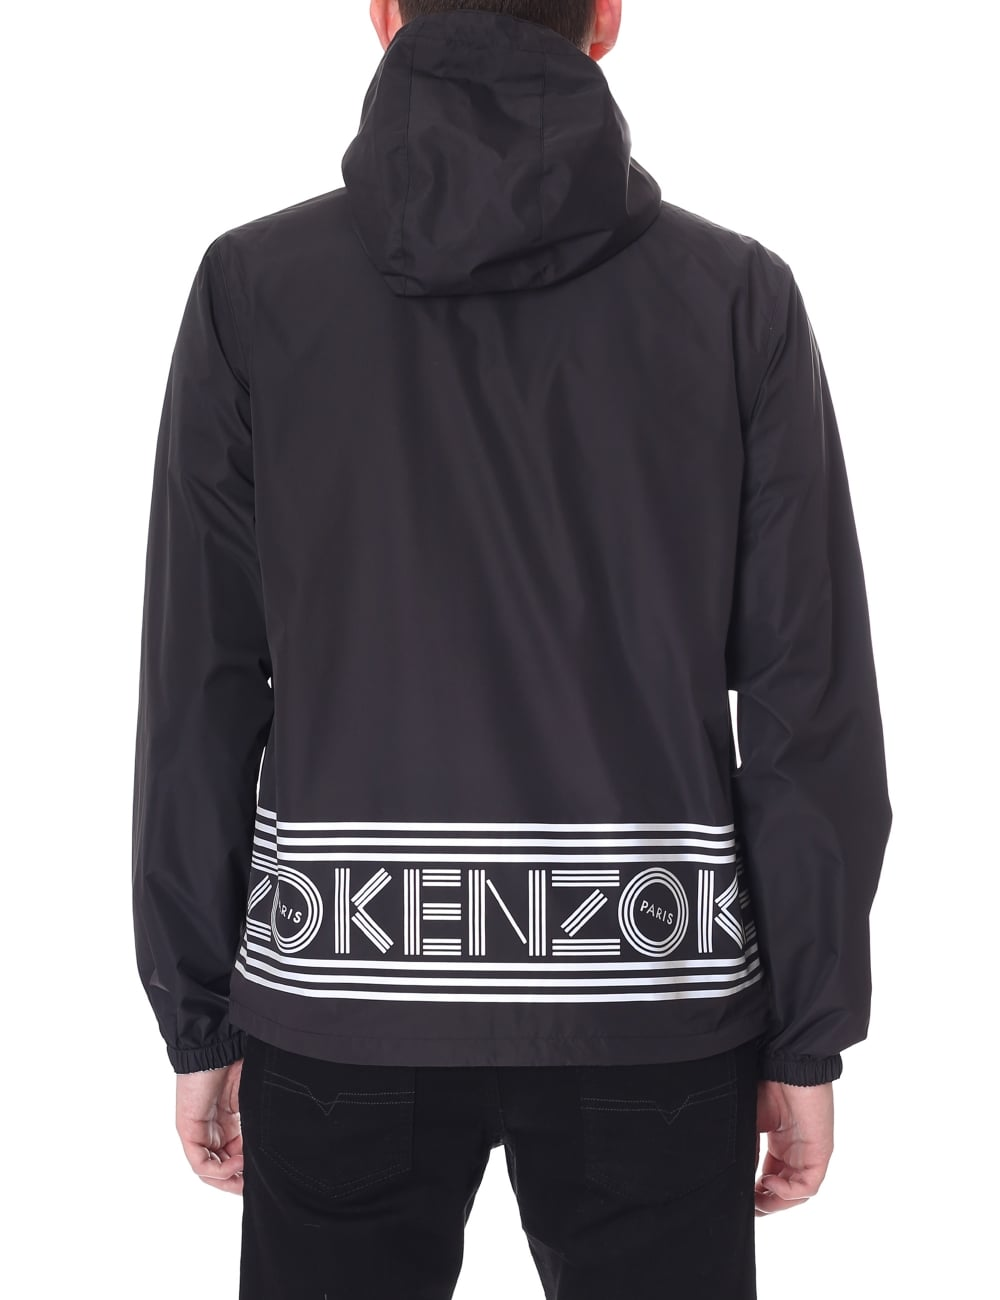 43e23789 Kenzo Men's Reversible Hooded Windbreaker